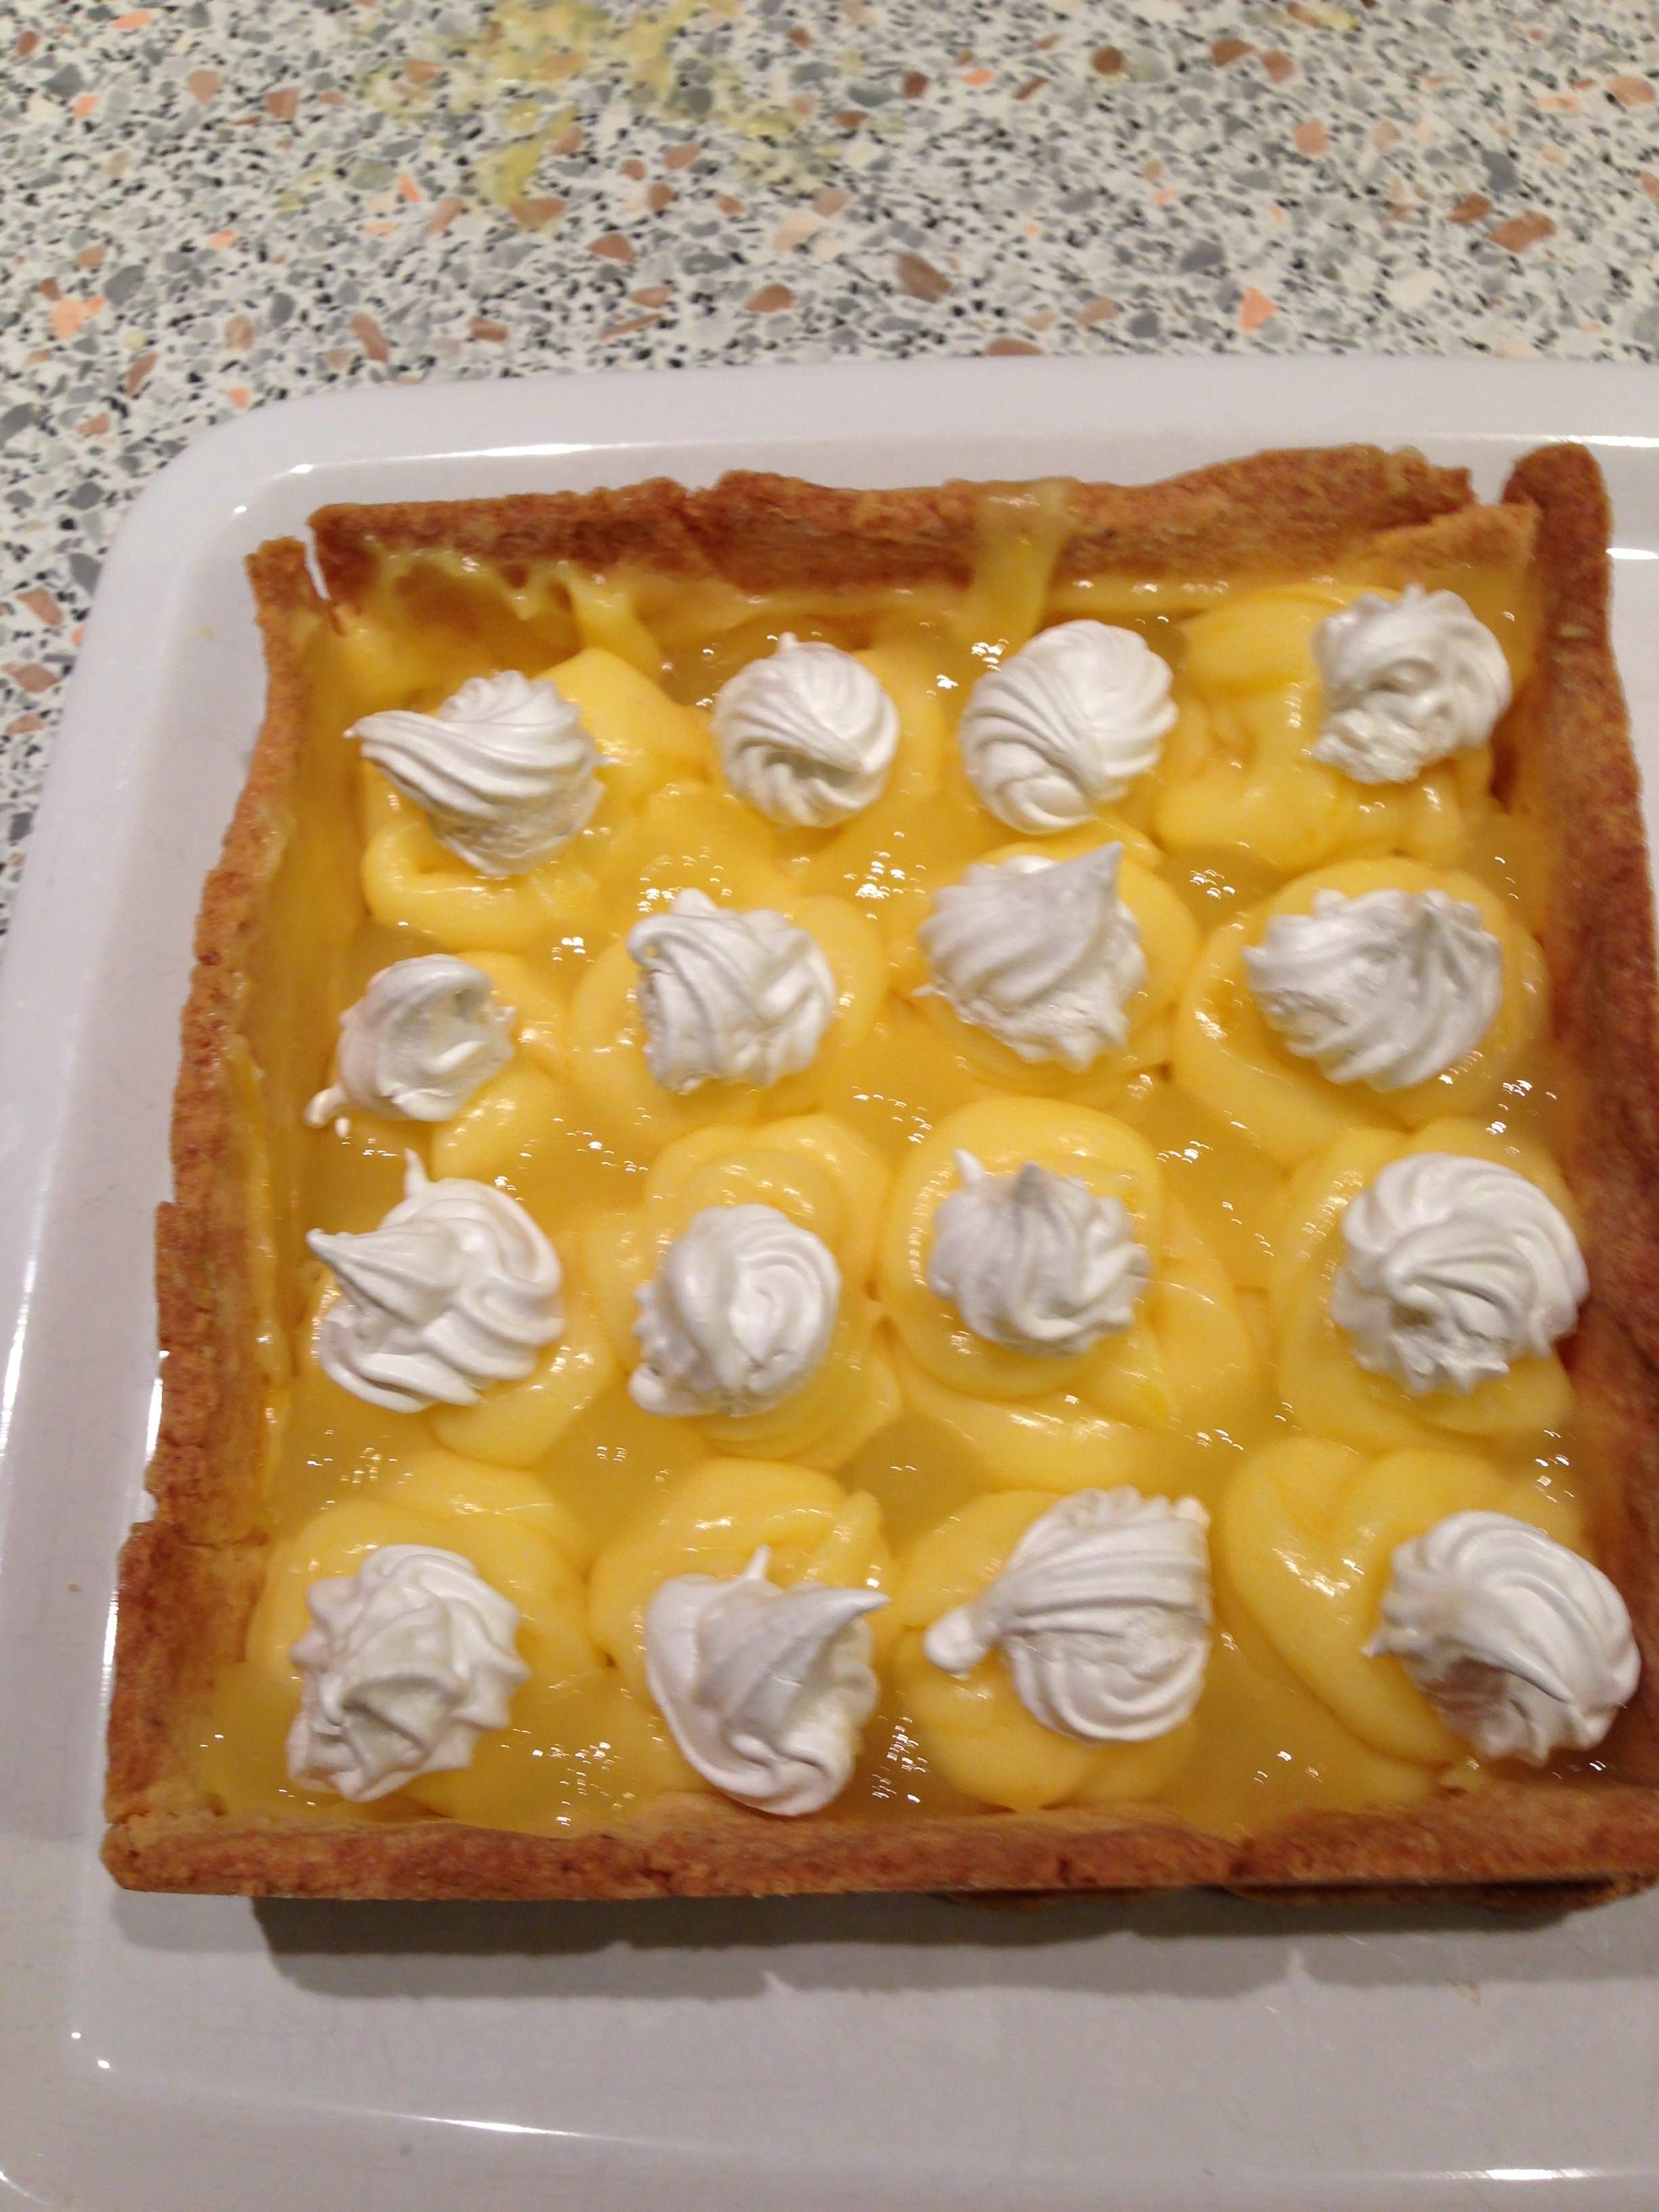 Tarte au citron meringu e cyril lignac sevencuisine - Tarte au citron meringuee herve cuisine ...